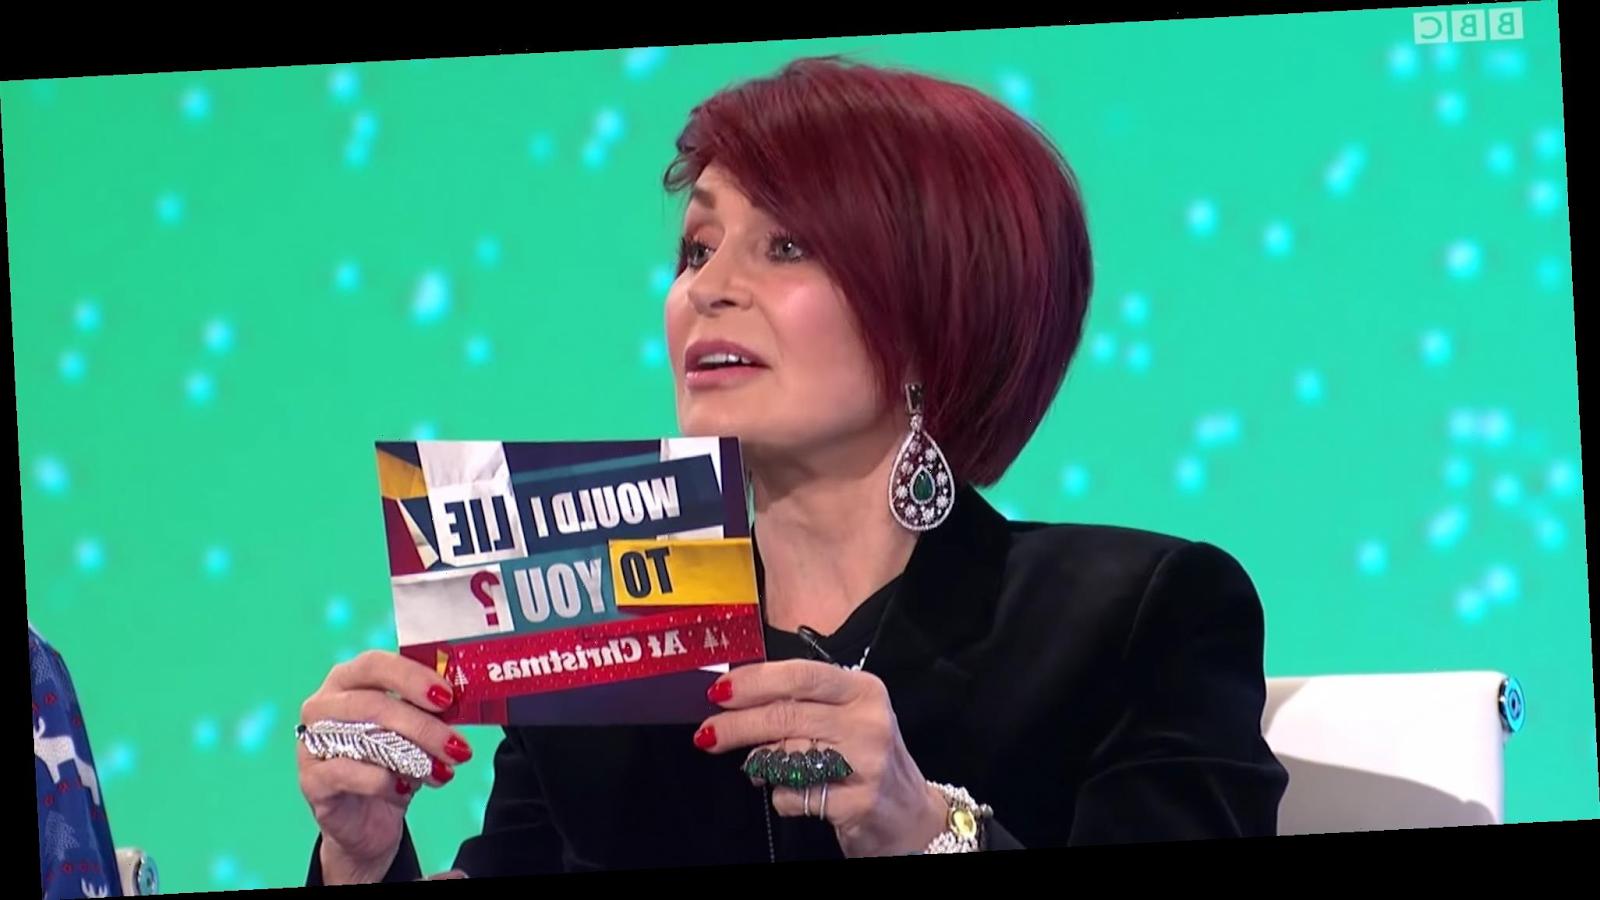 ¿Sharon Osbourne obligó a un asistente a adentrarse en incendio?